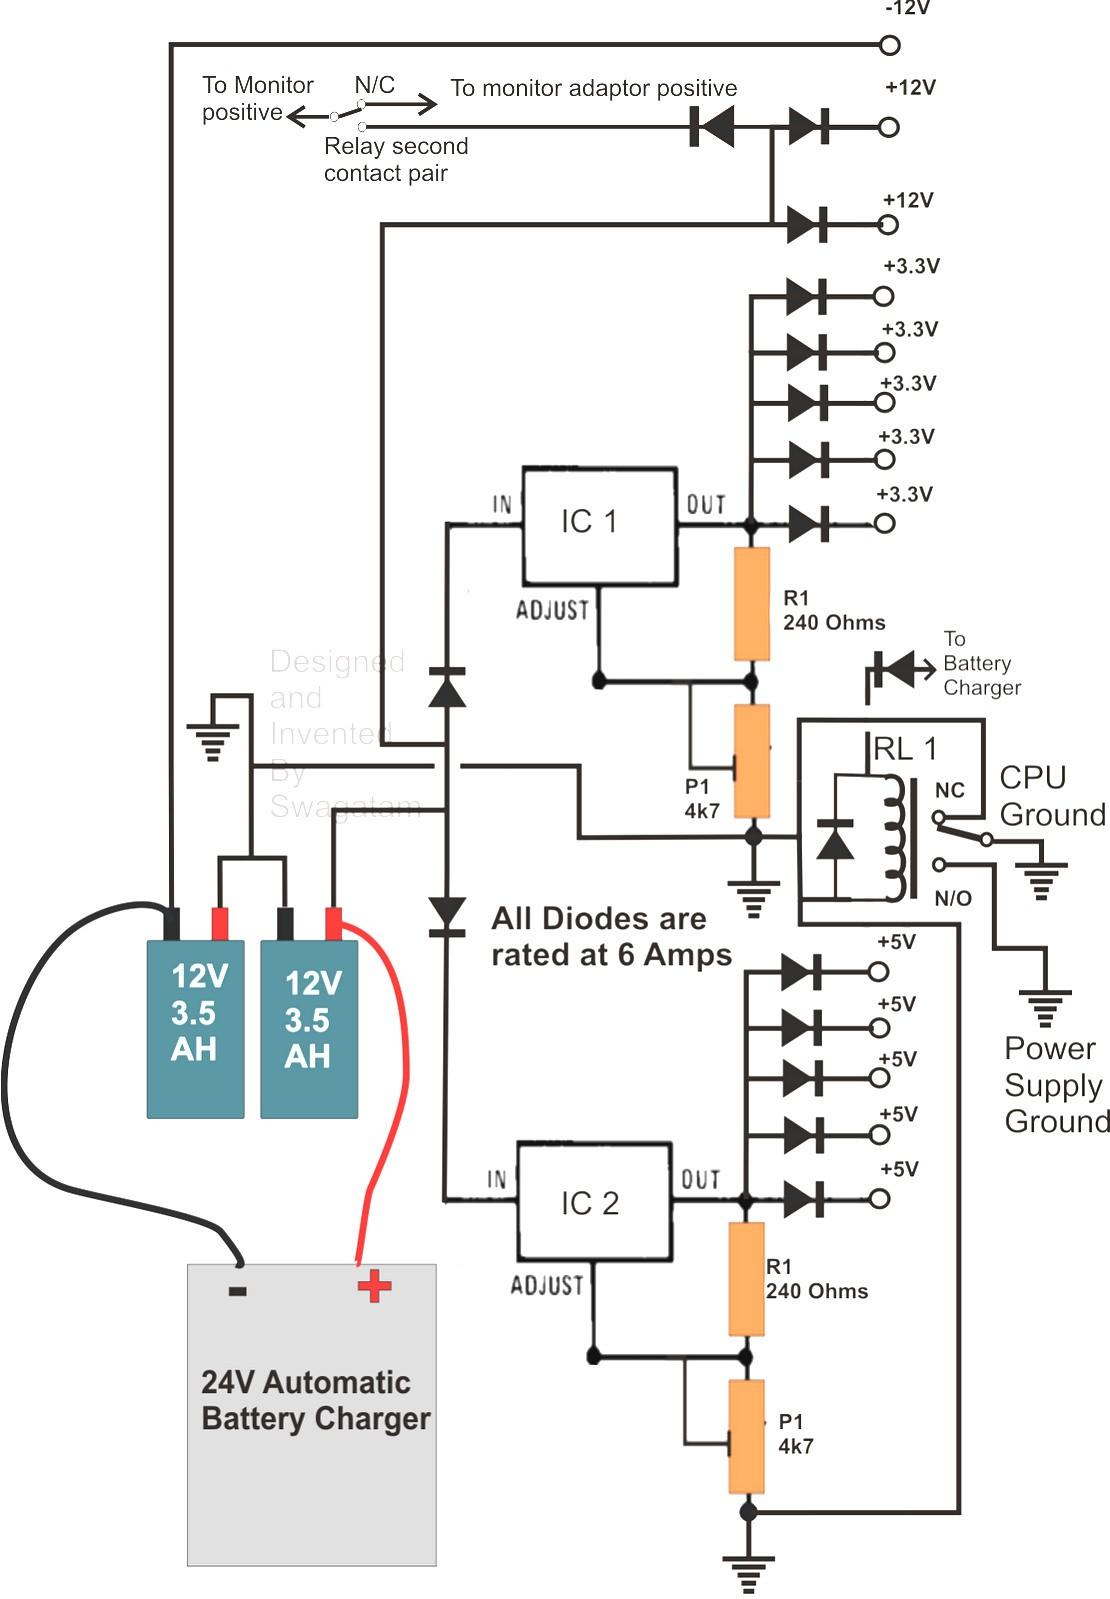 mini cooper harman kardon wiring diagram